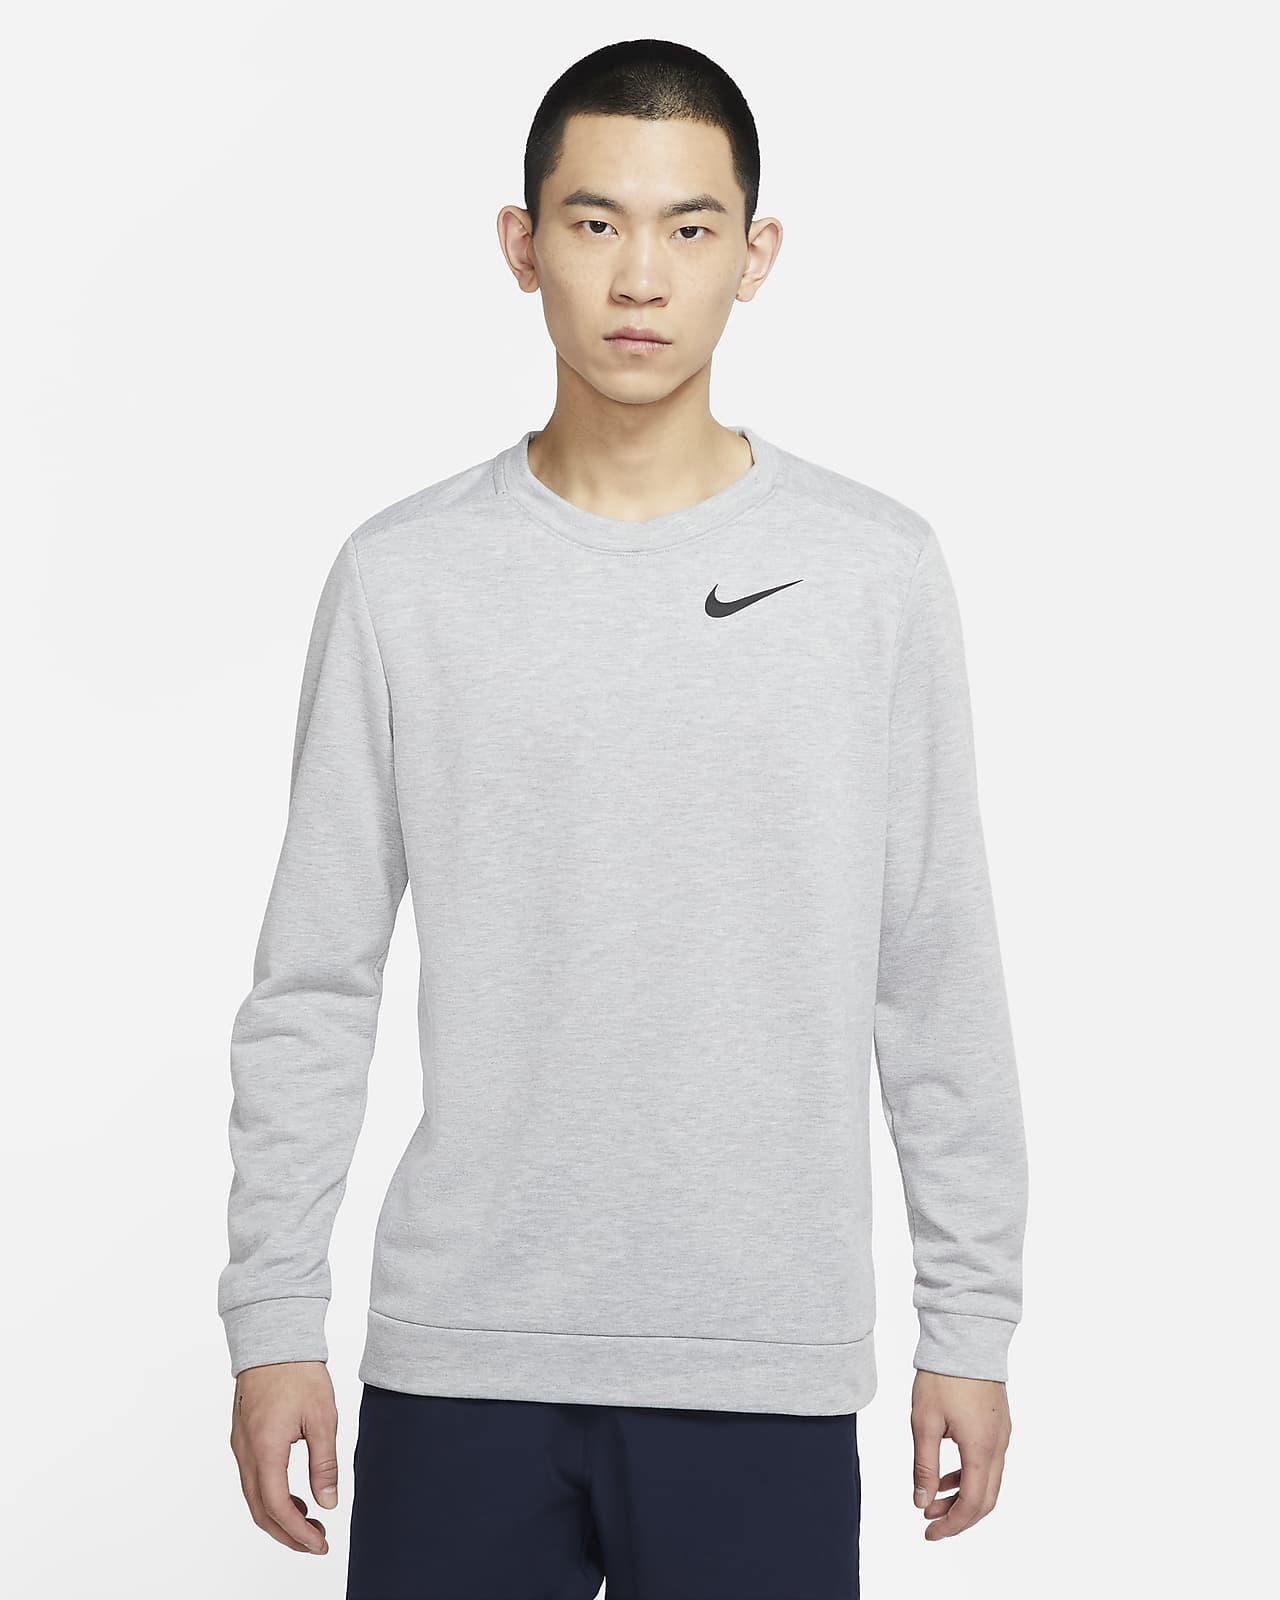 Nike Dri-FIT 男子针织训练圆领上衣